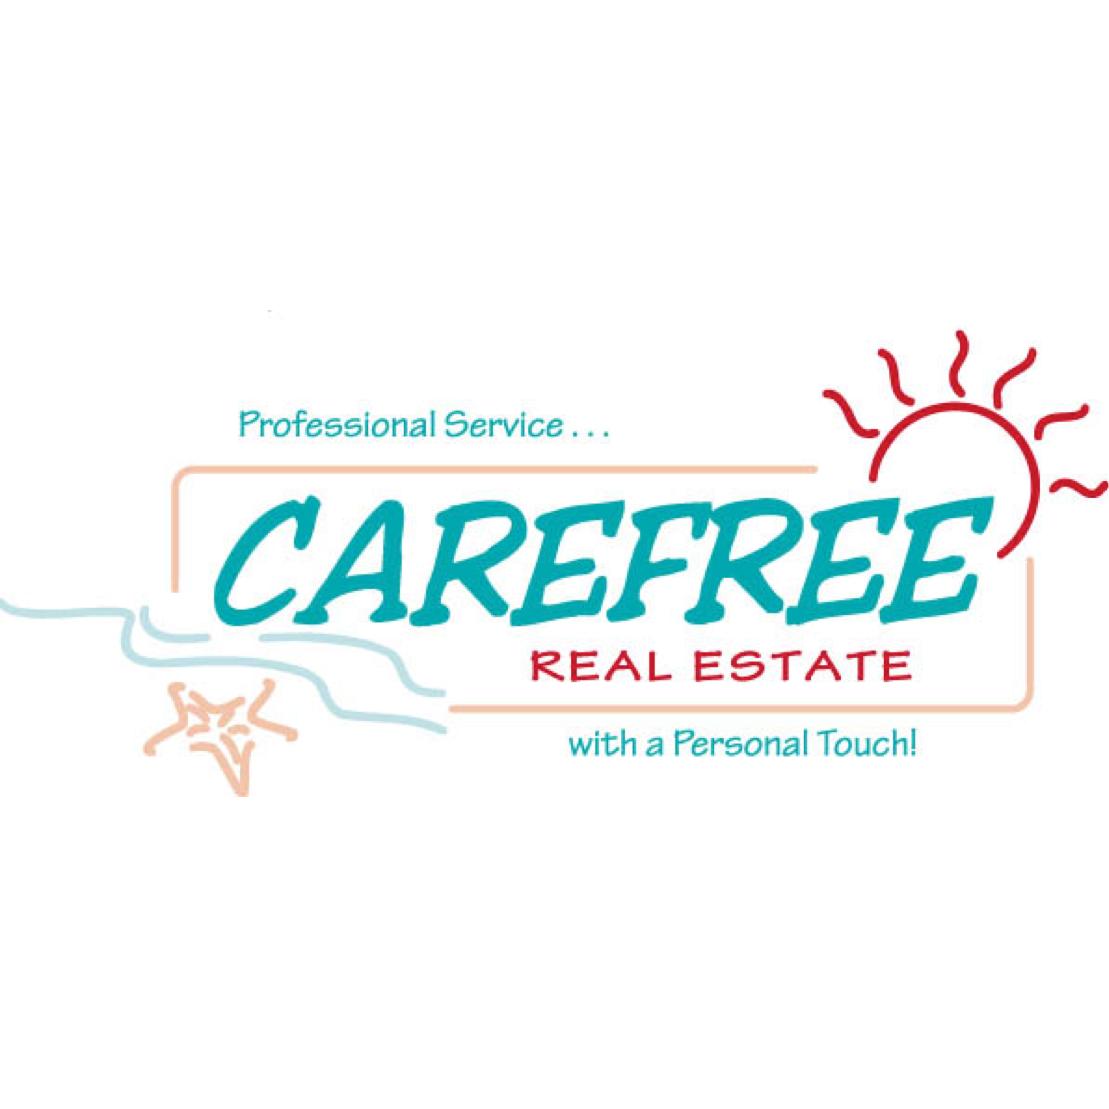 Carefree Real Estate